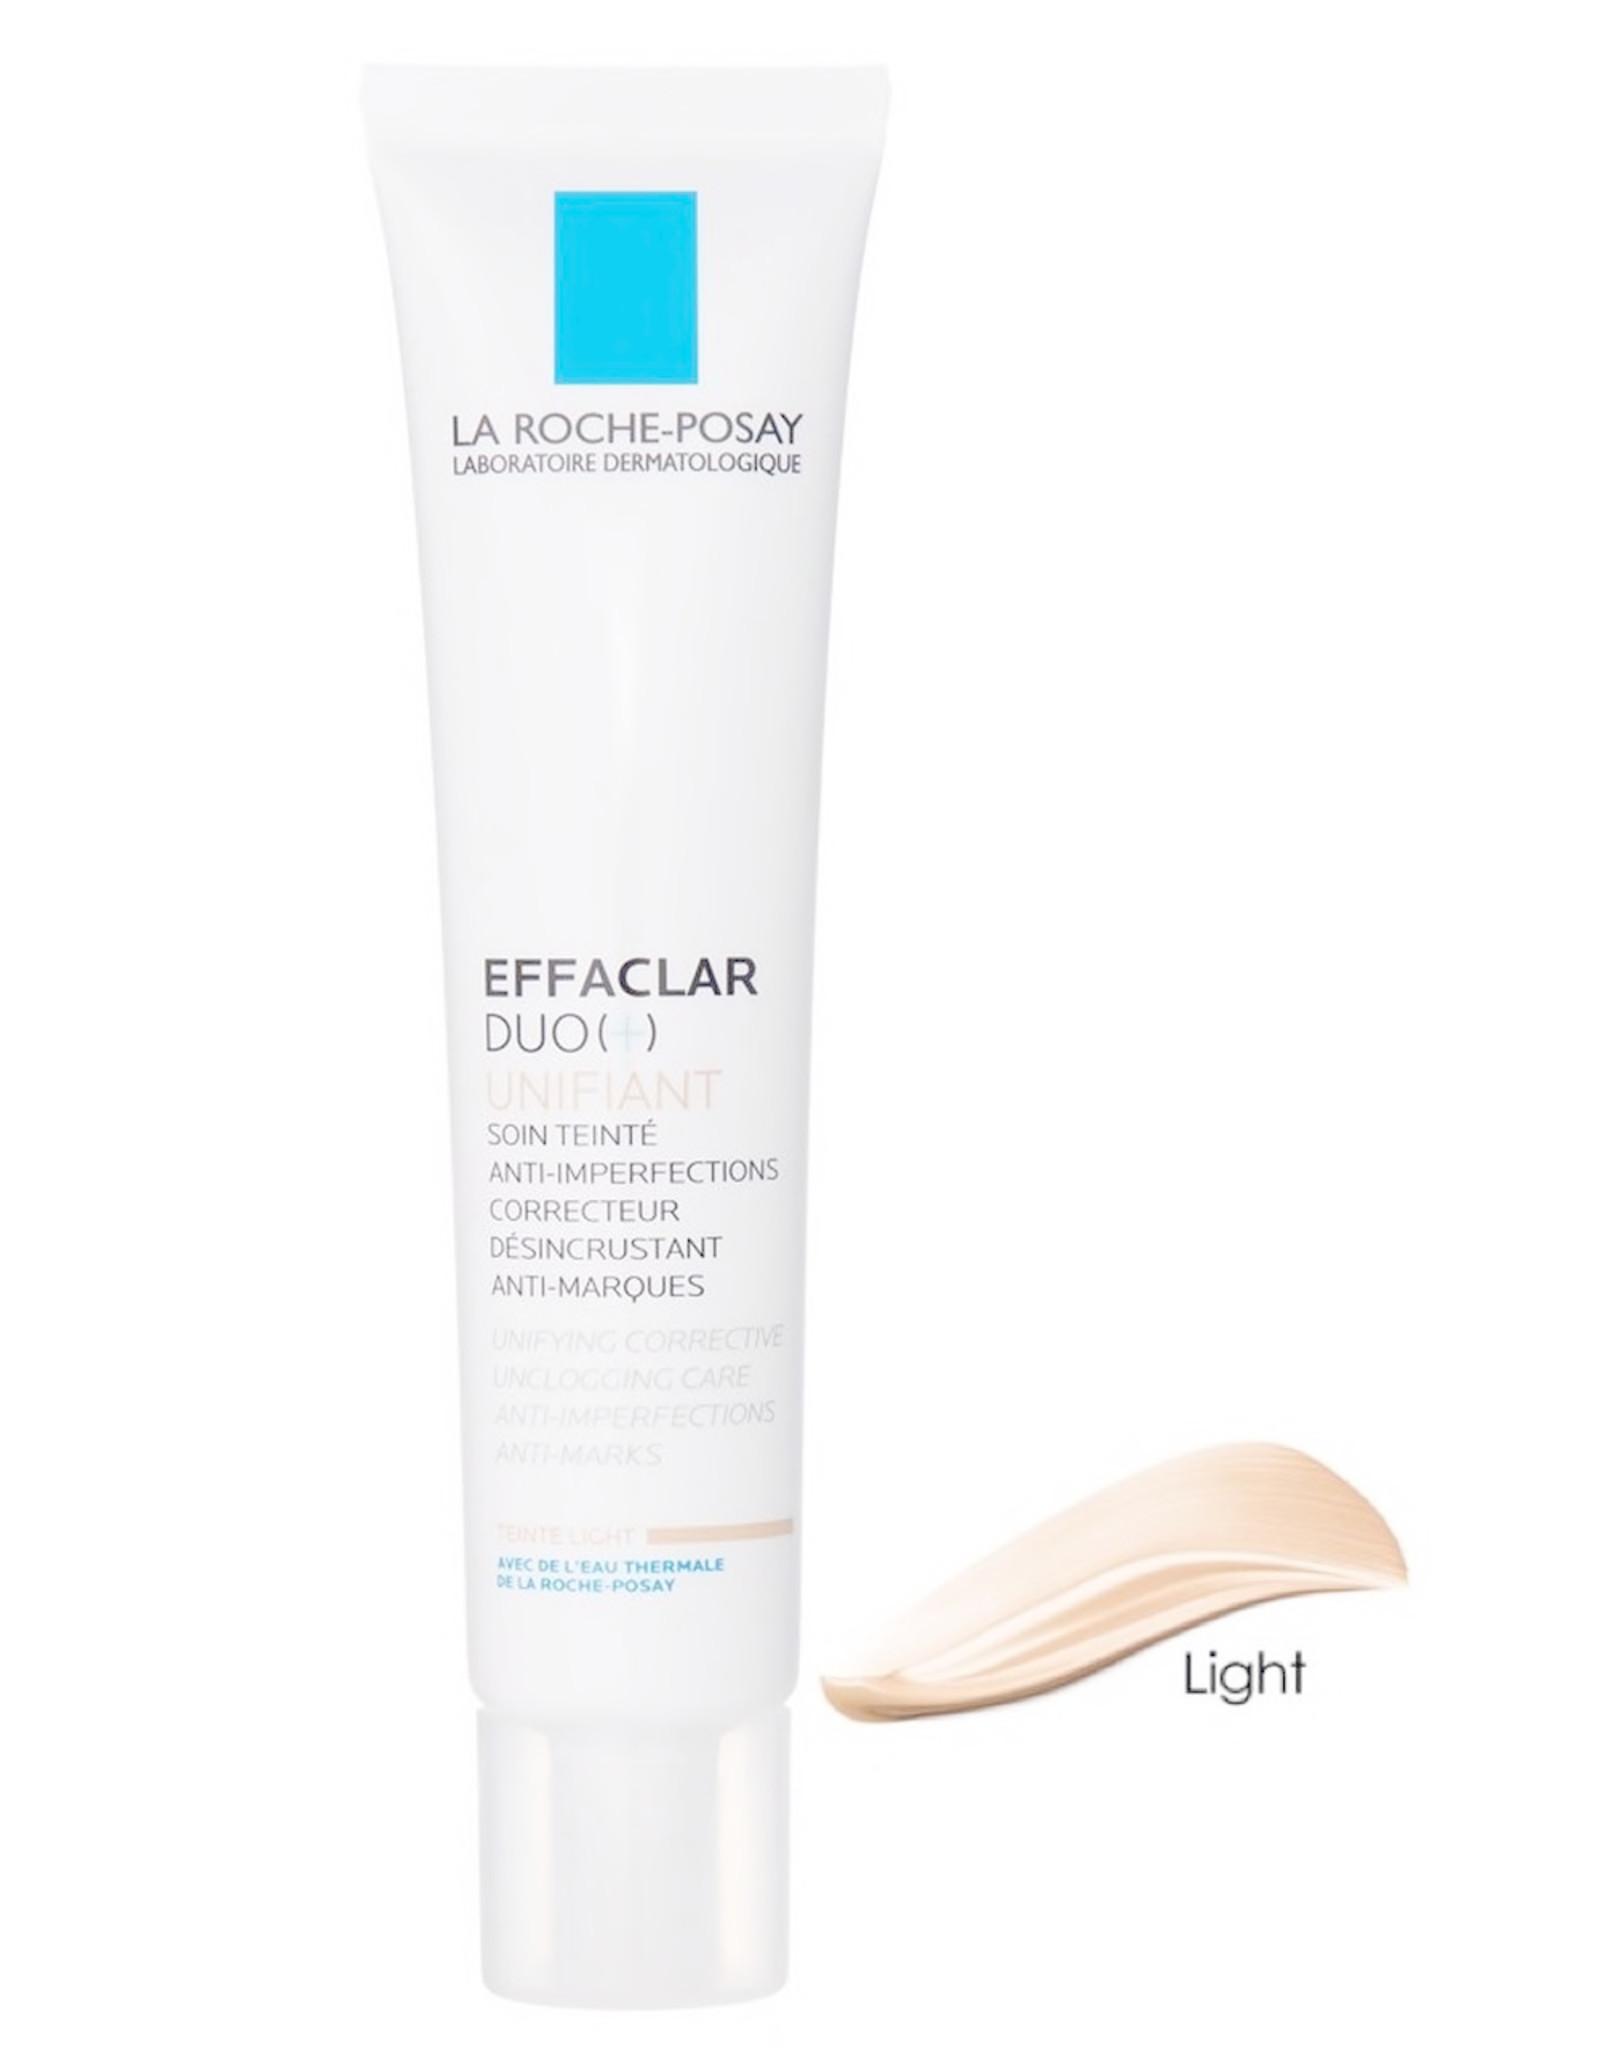 La Roche Posay Effaclar Duo+ gel creme Unifiant Tint 40ml